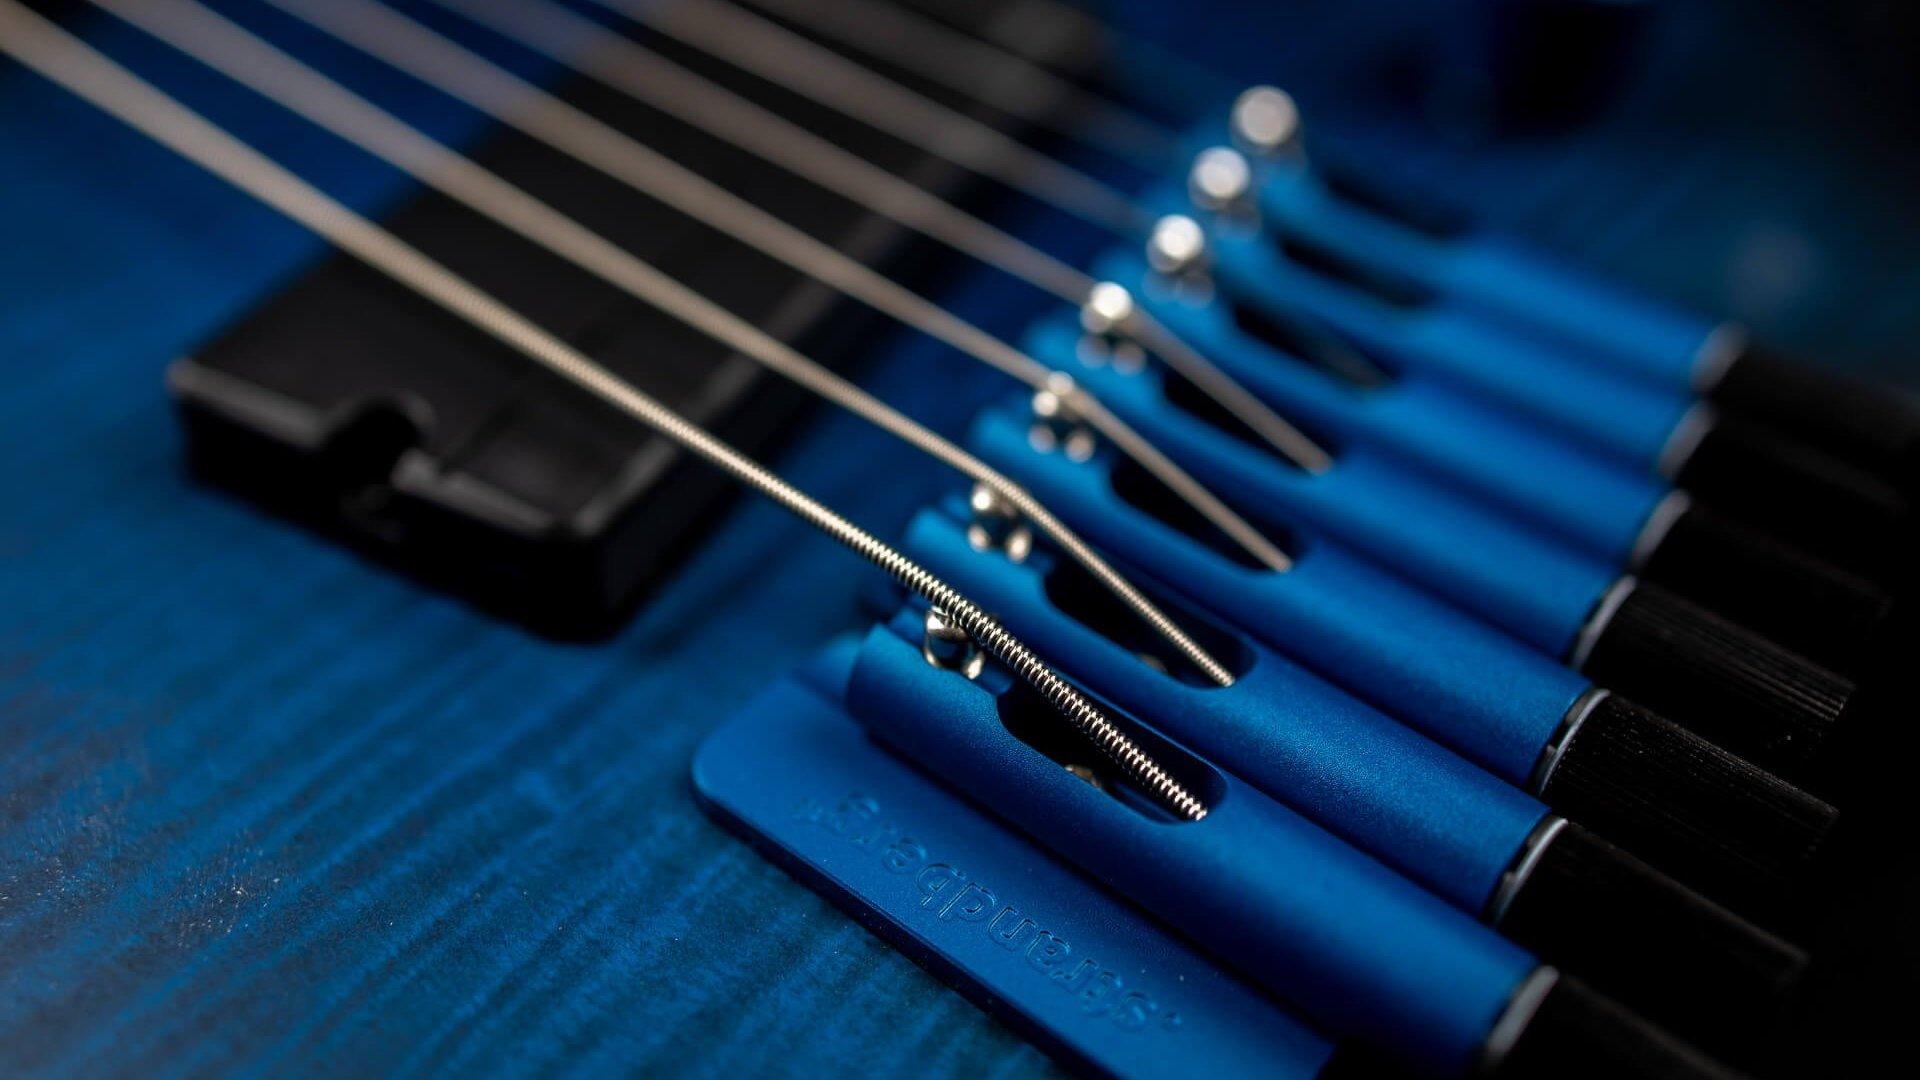 True Temperament Blue 7 string headless guitar closeup strings